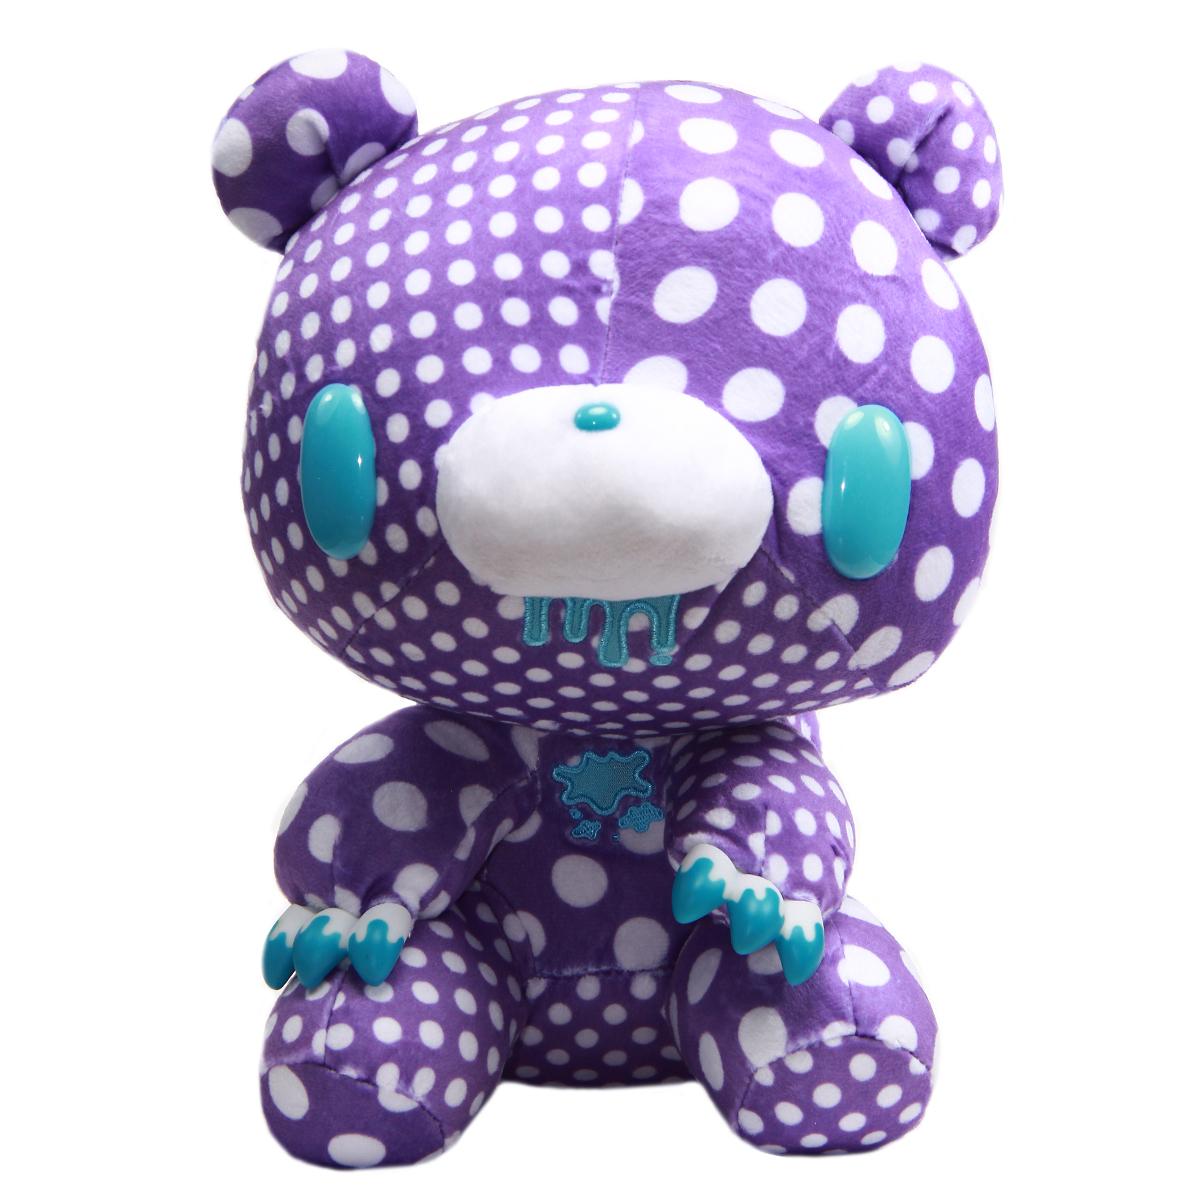 Taito Textillic Crazy Dots Gloomy Bear Plush Doll Purple White GP #556 12 Inches